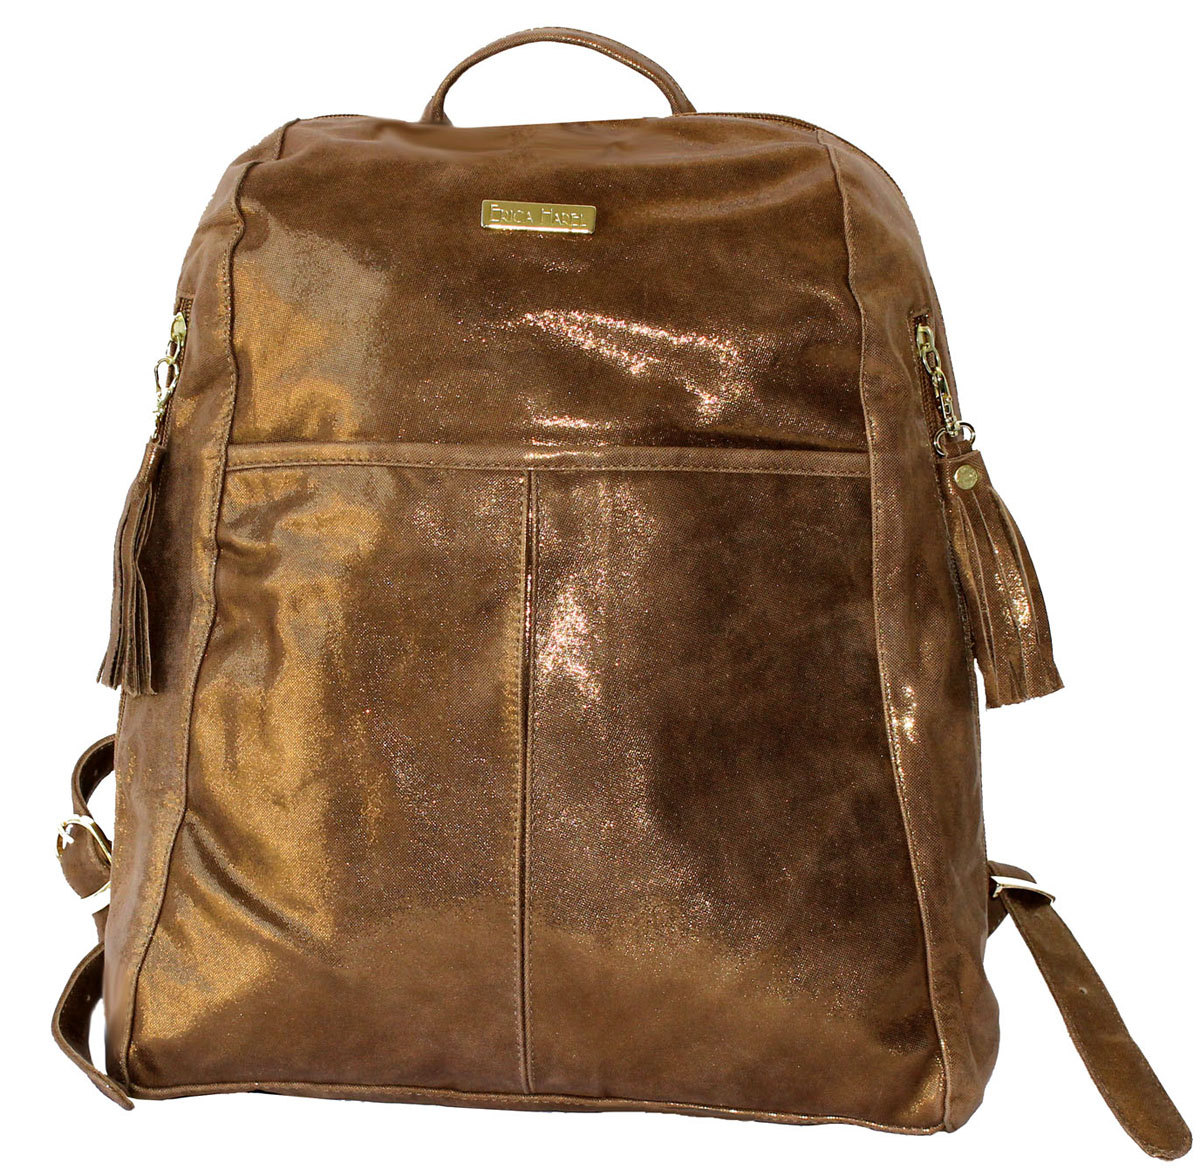 Erica Harel Metallic Leather Bag, Soft Brown Leather Backpack, Copper Metallic Bag, Soft Leather